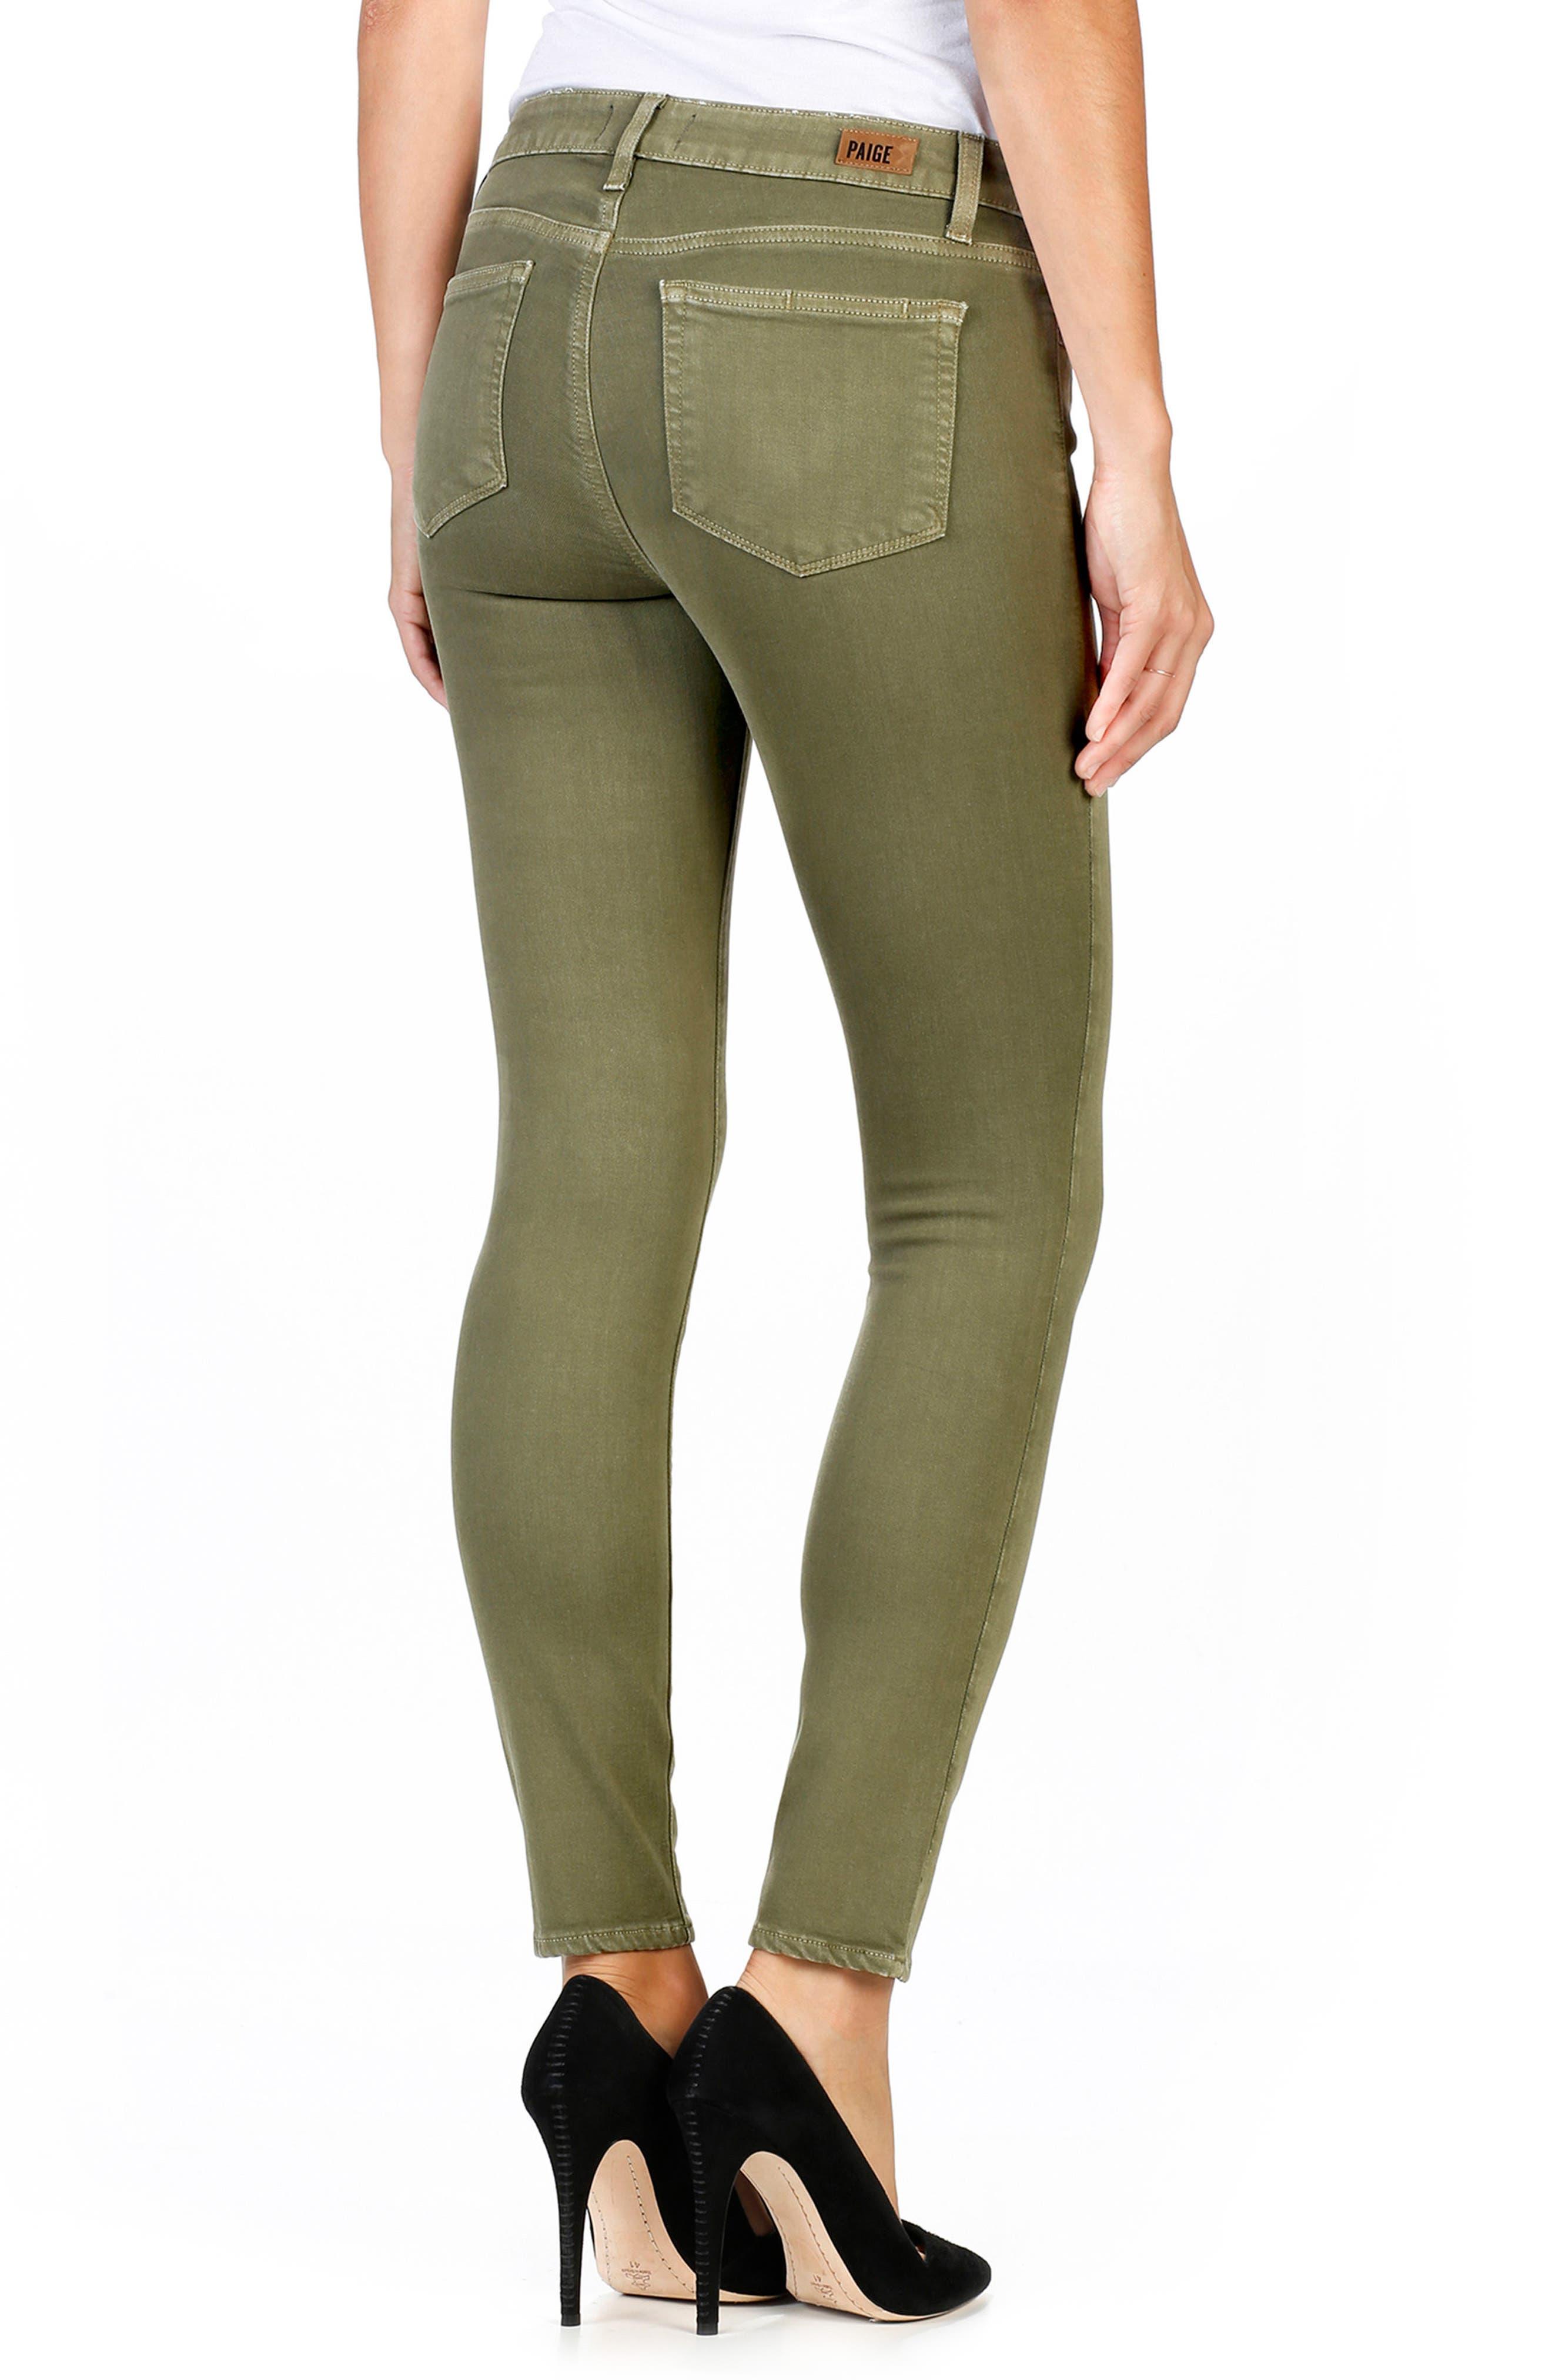 Transcend - Verdugo Ankle Skinny Jeans,                             Alternate thumbnail 3, color,                             300